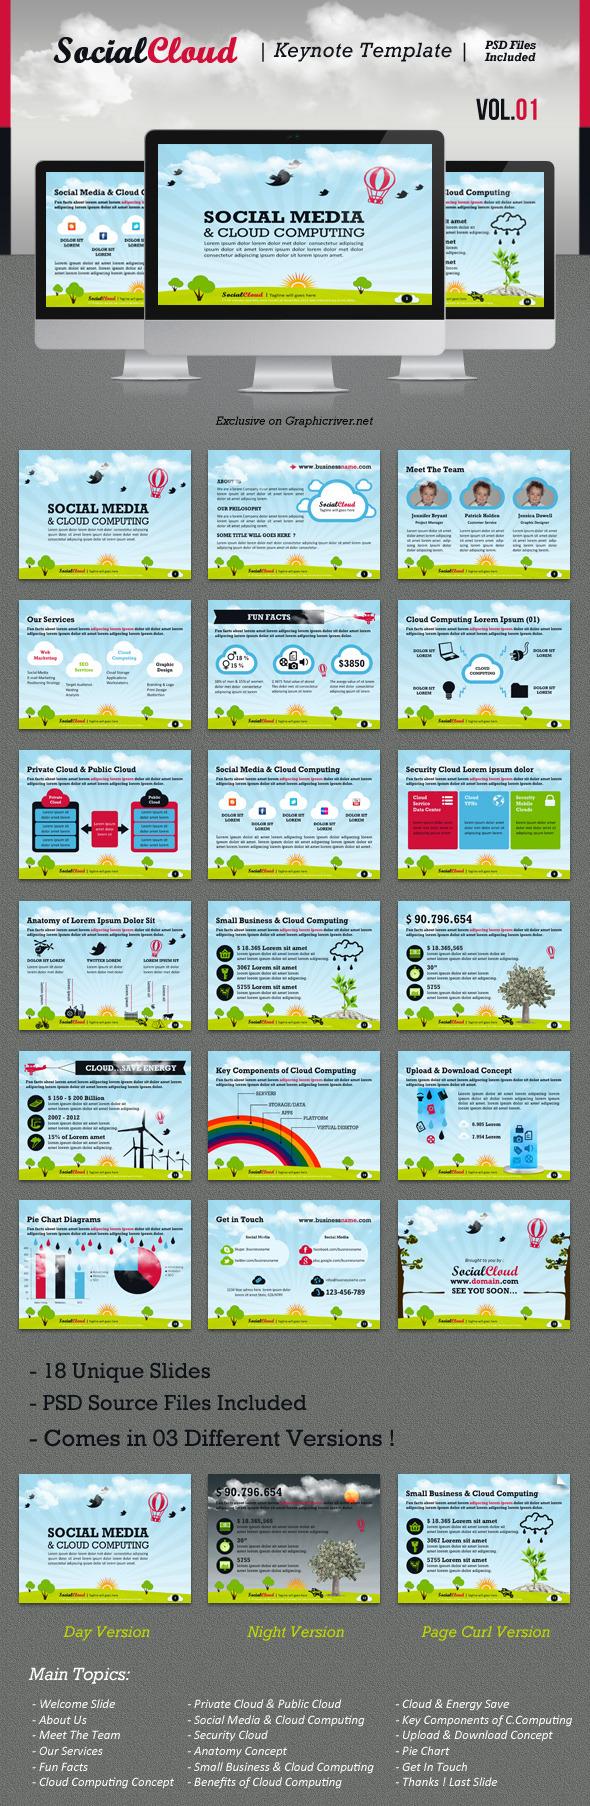 SocialCloud Keynote Template V.01 - Creative Keynote Templates